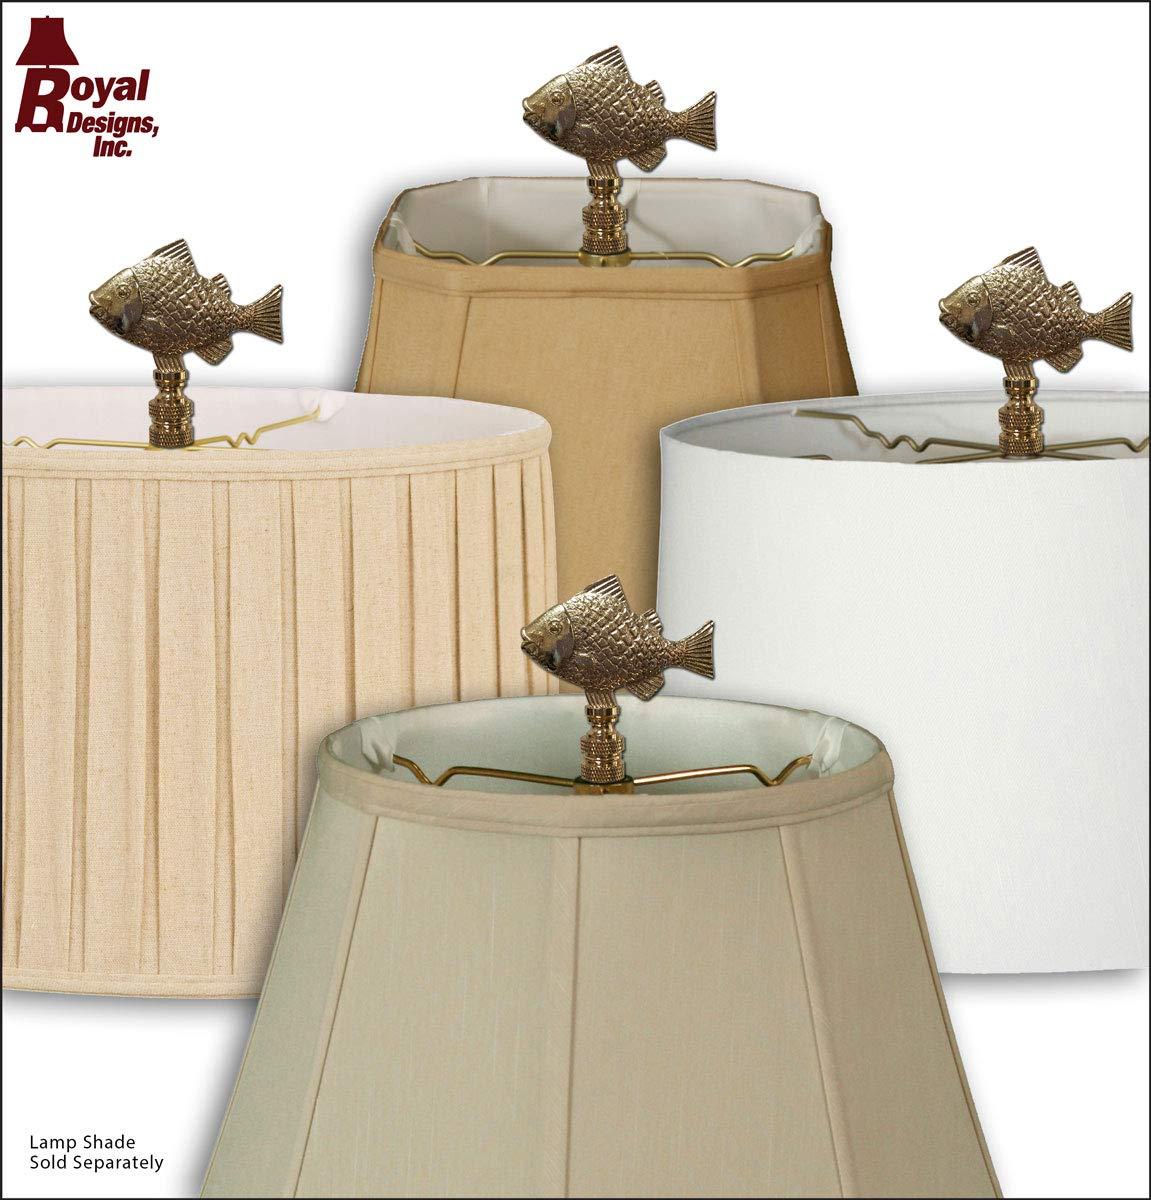 Royal Designs F-5067AB-2 Fish Design Lamp Finial Antique Brass Set of 2